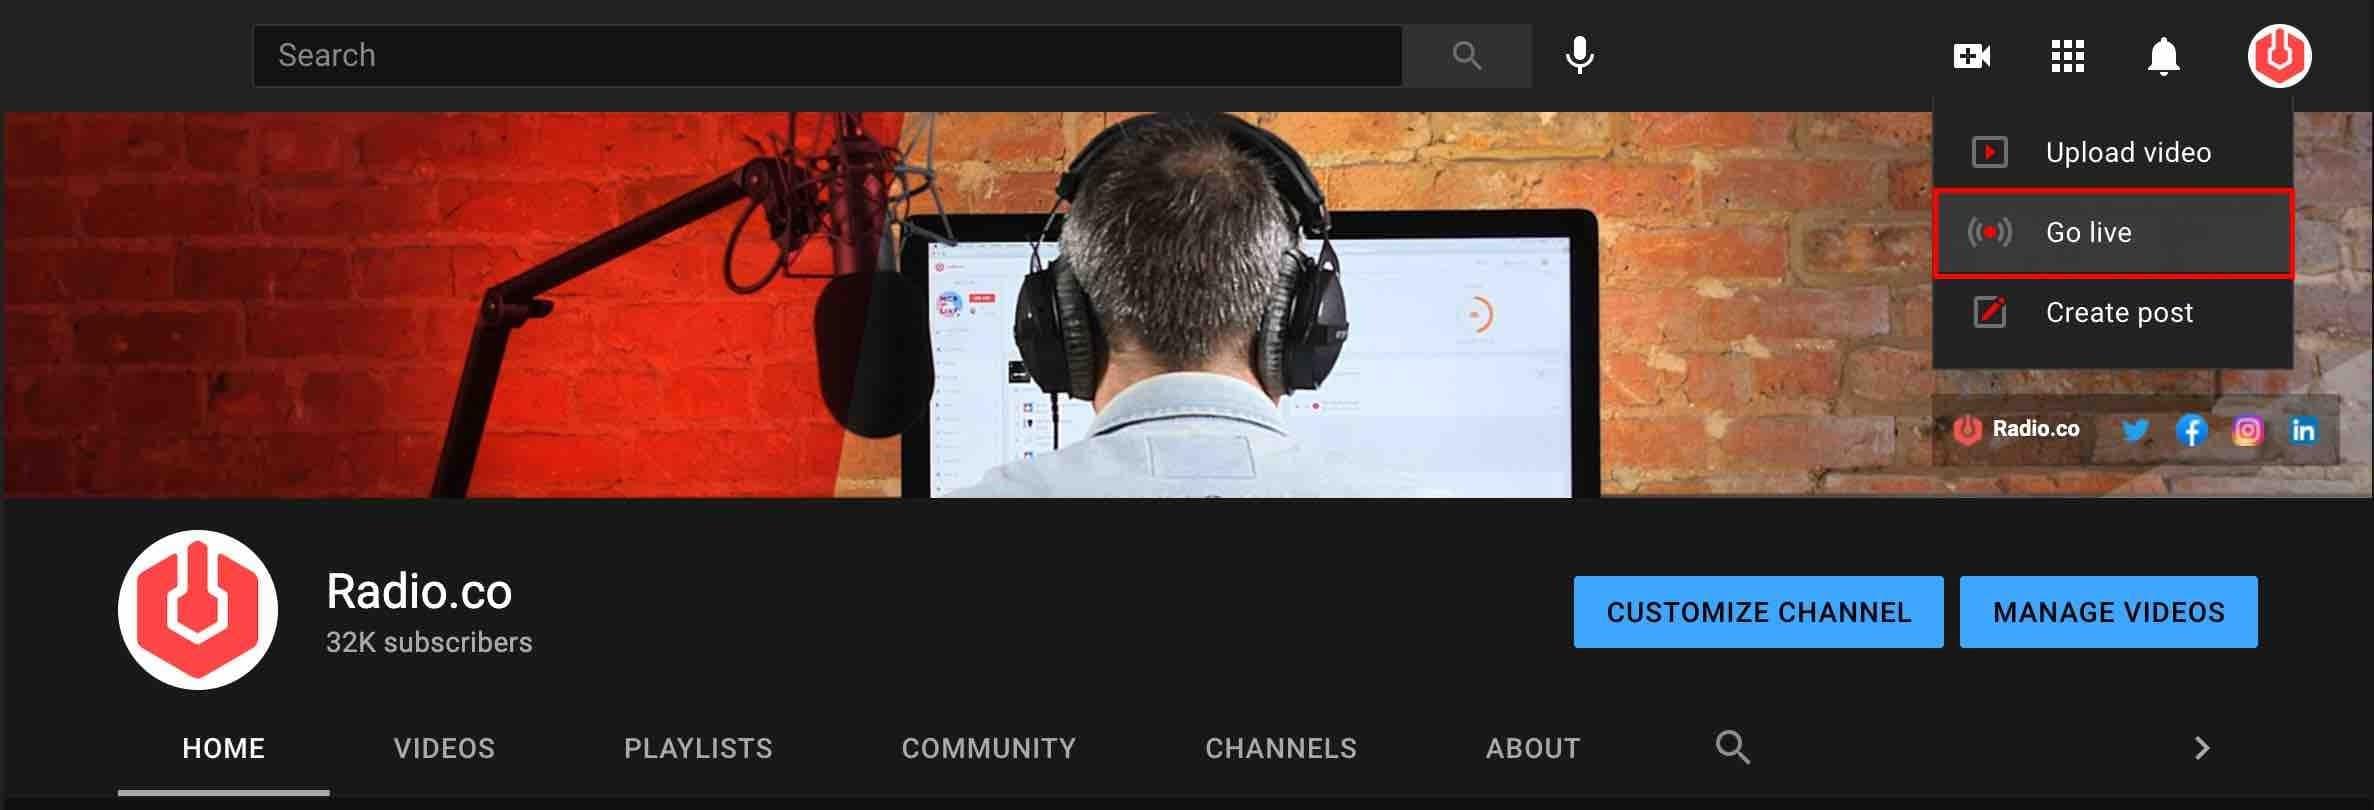 How to Broadcast Radio on Youtube Go Live